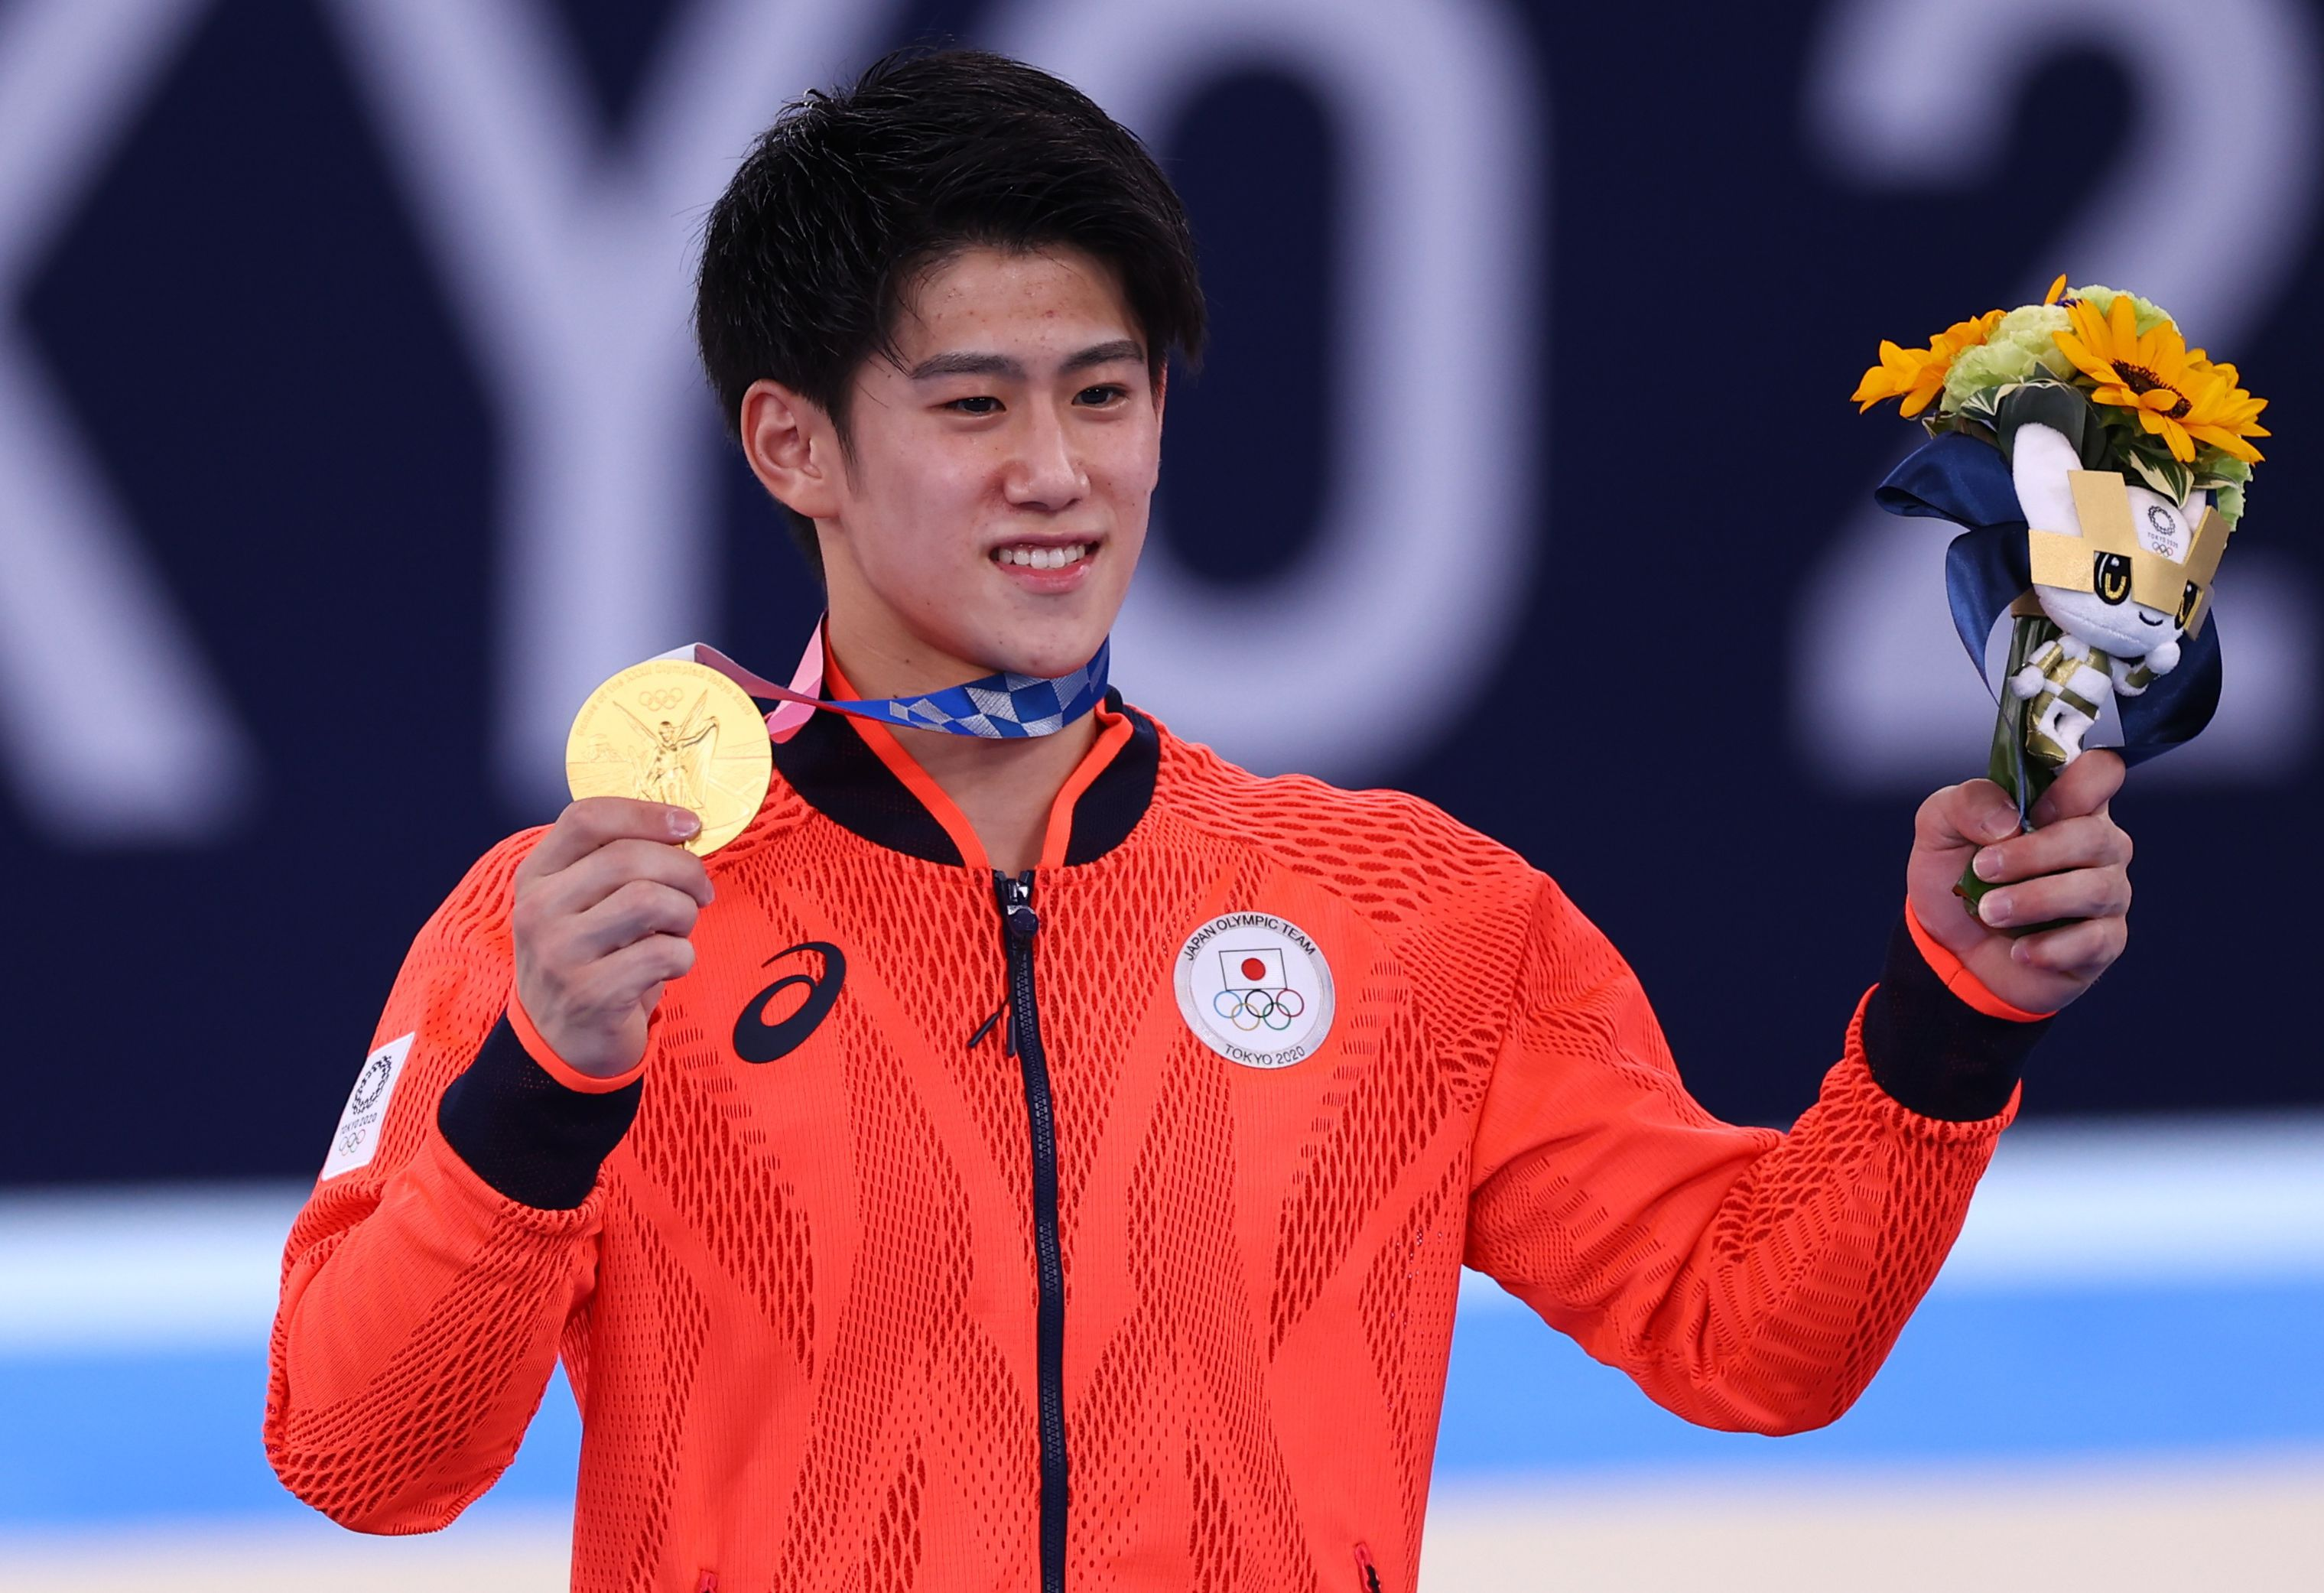 Tokyo 2020 Olympics - Gymnastics - Artistic - Men's Individual All-Around - Medal Ceremony - Ariake Gymnastics Centre, Tokyo, Japan - July 28, 2021.  Daiki Hashimoto of Japan poses with his gold medal. REUTERS/Mike Blake